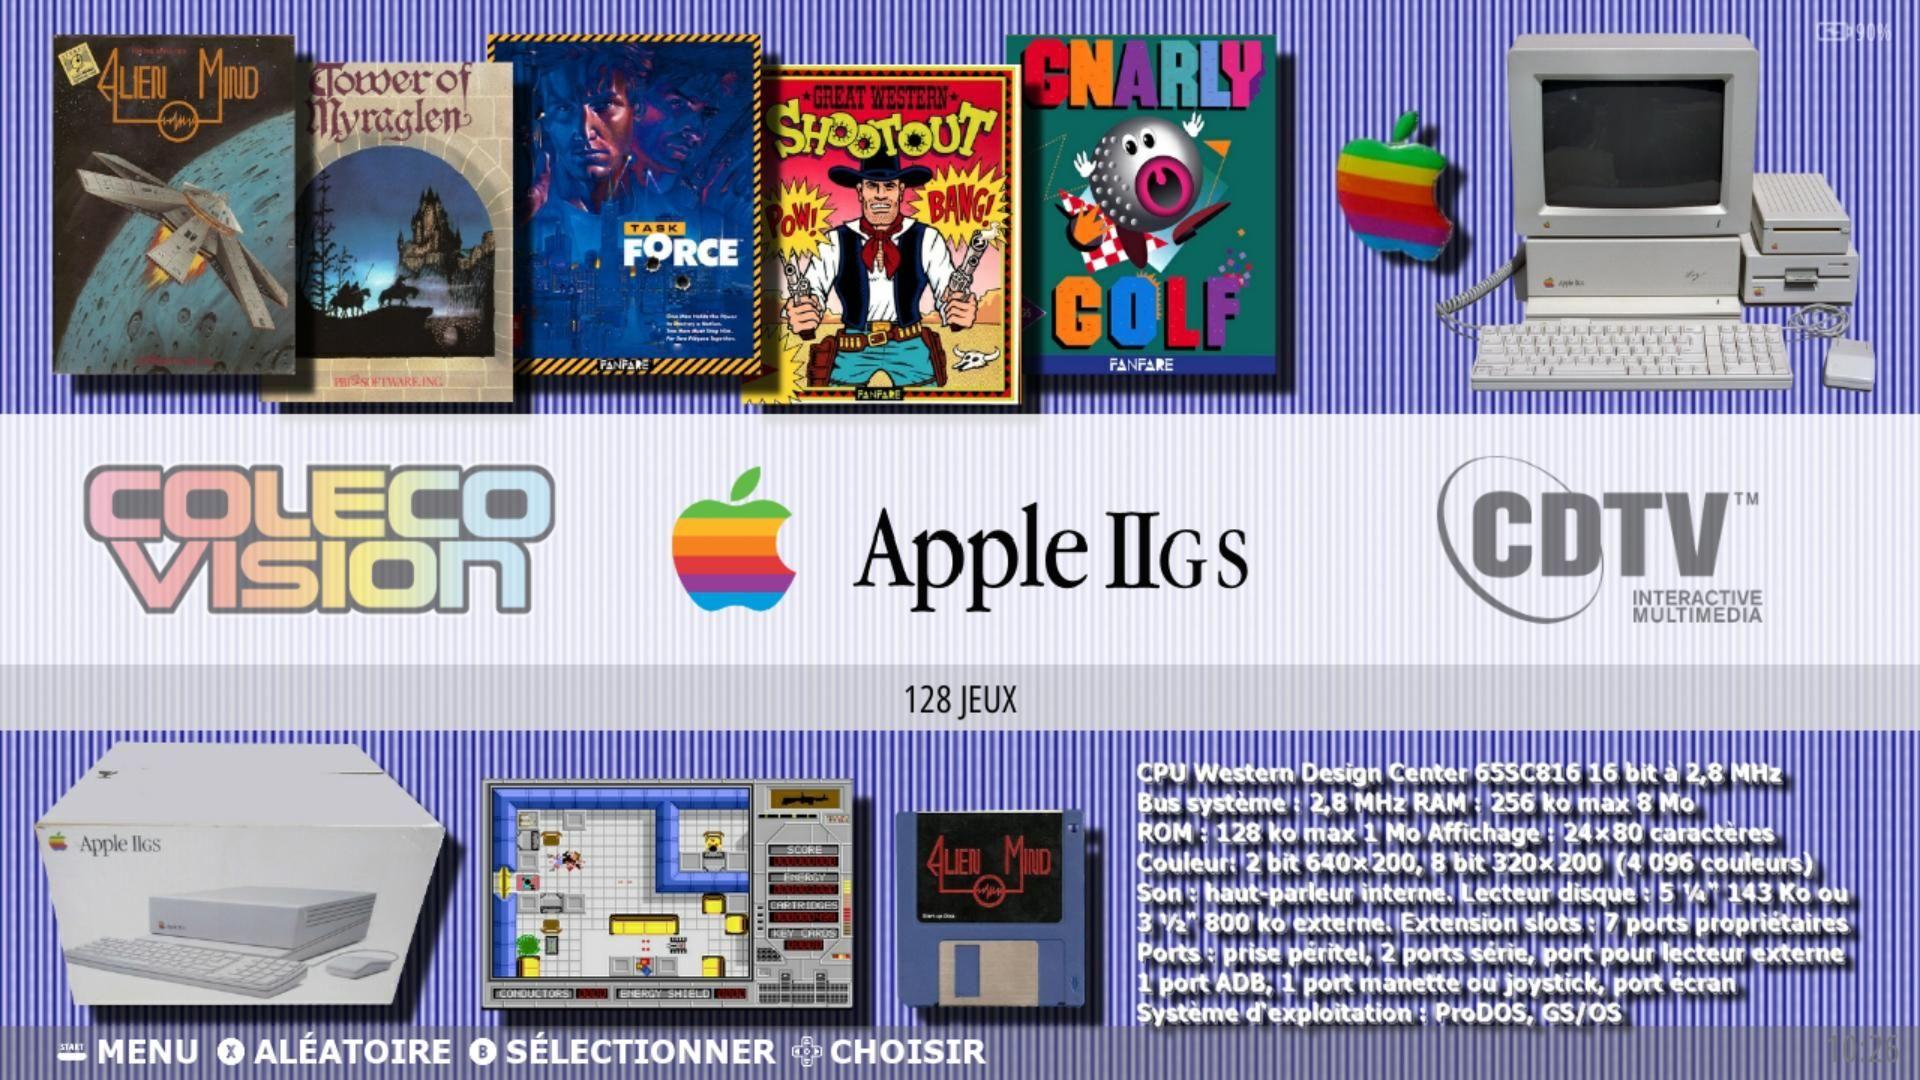 apple2gs.jpg